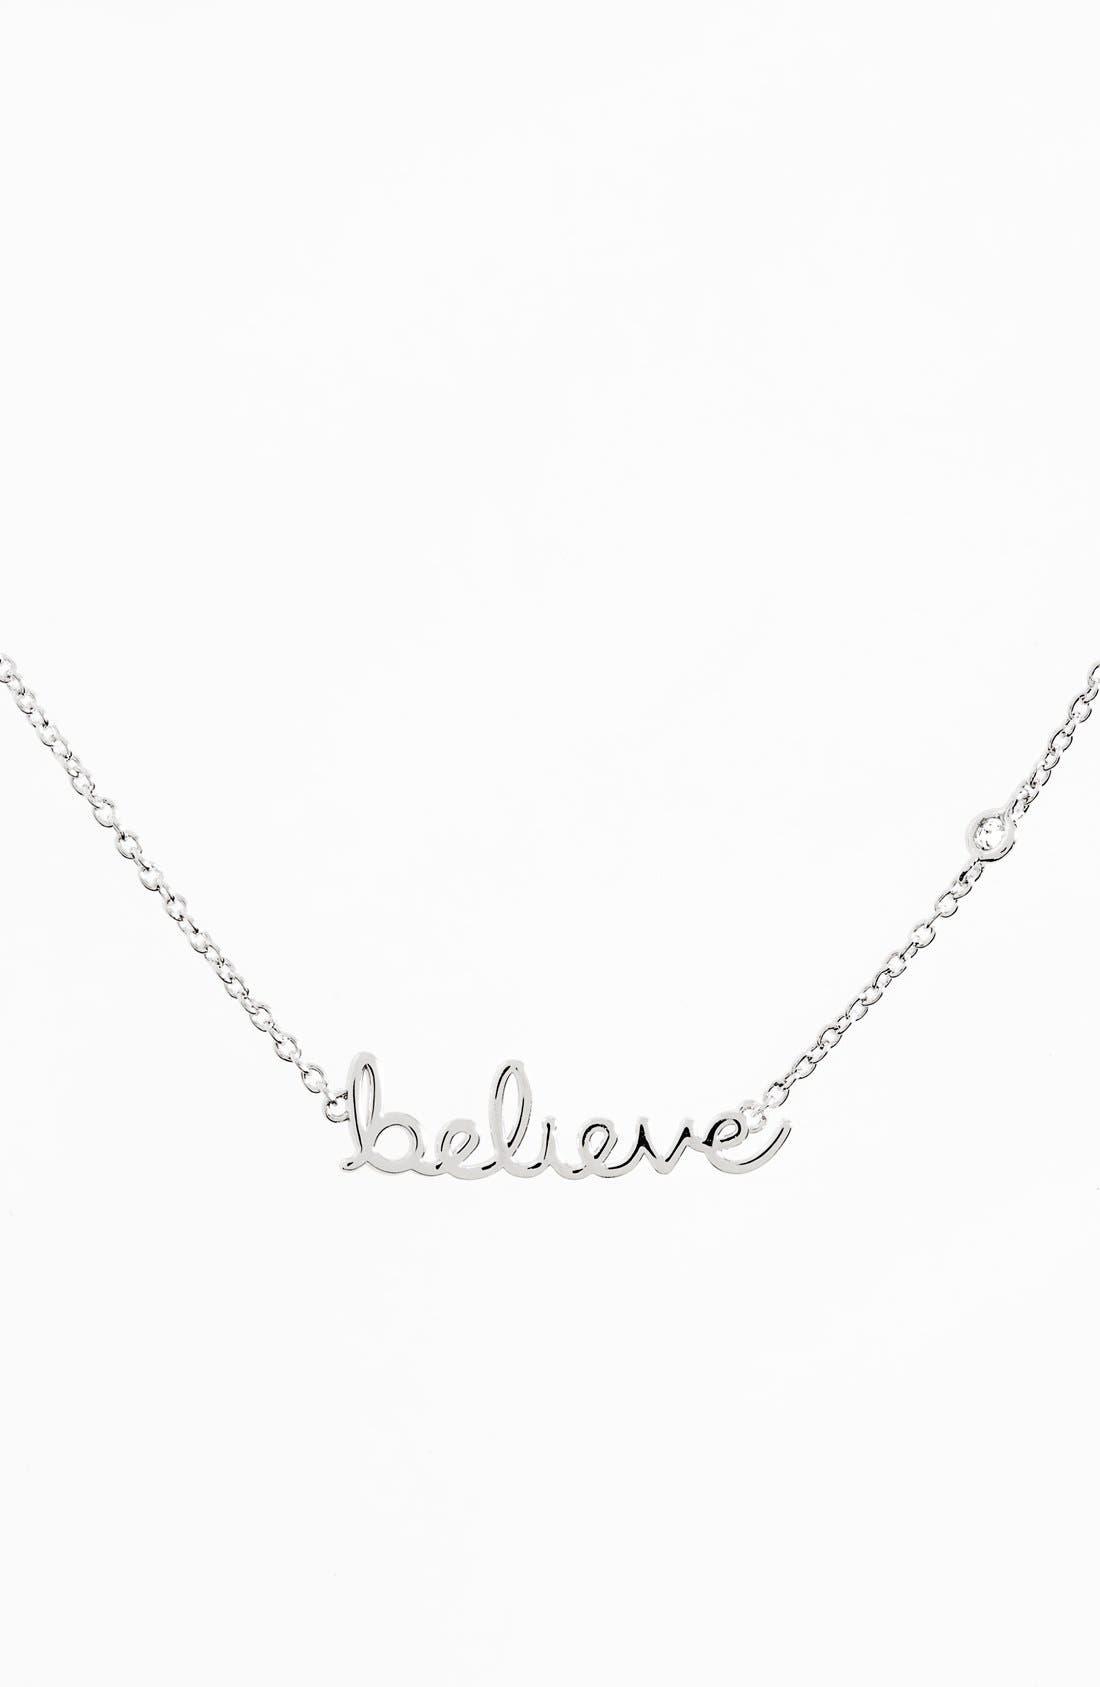 SHY by Sydney Evan 'Believe' Necklace